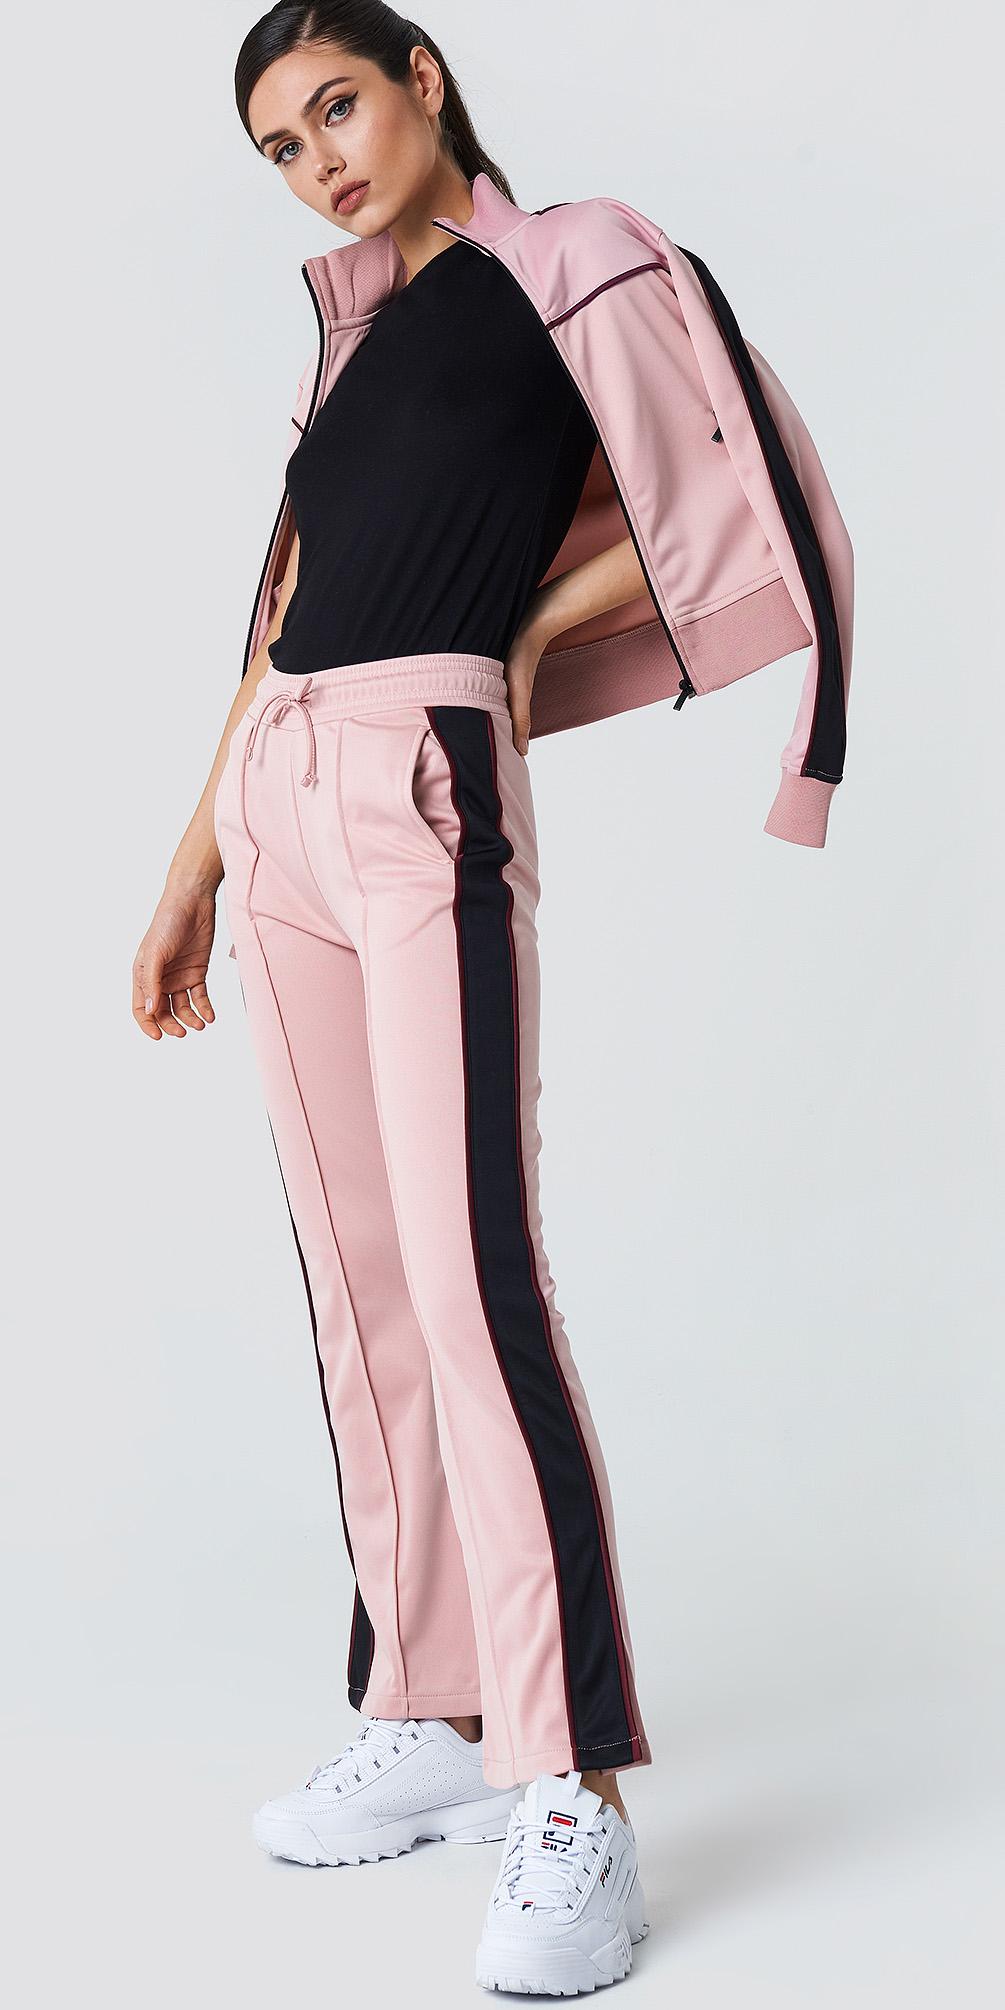 pink-light-wideleg-pants-trackpants-black-tee-pink-light-bomber-jacket-white-shoe-sneakers-pony-fall-winter-weekend.jpg